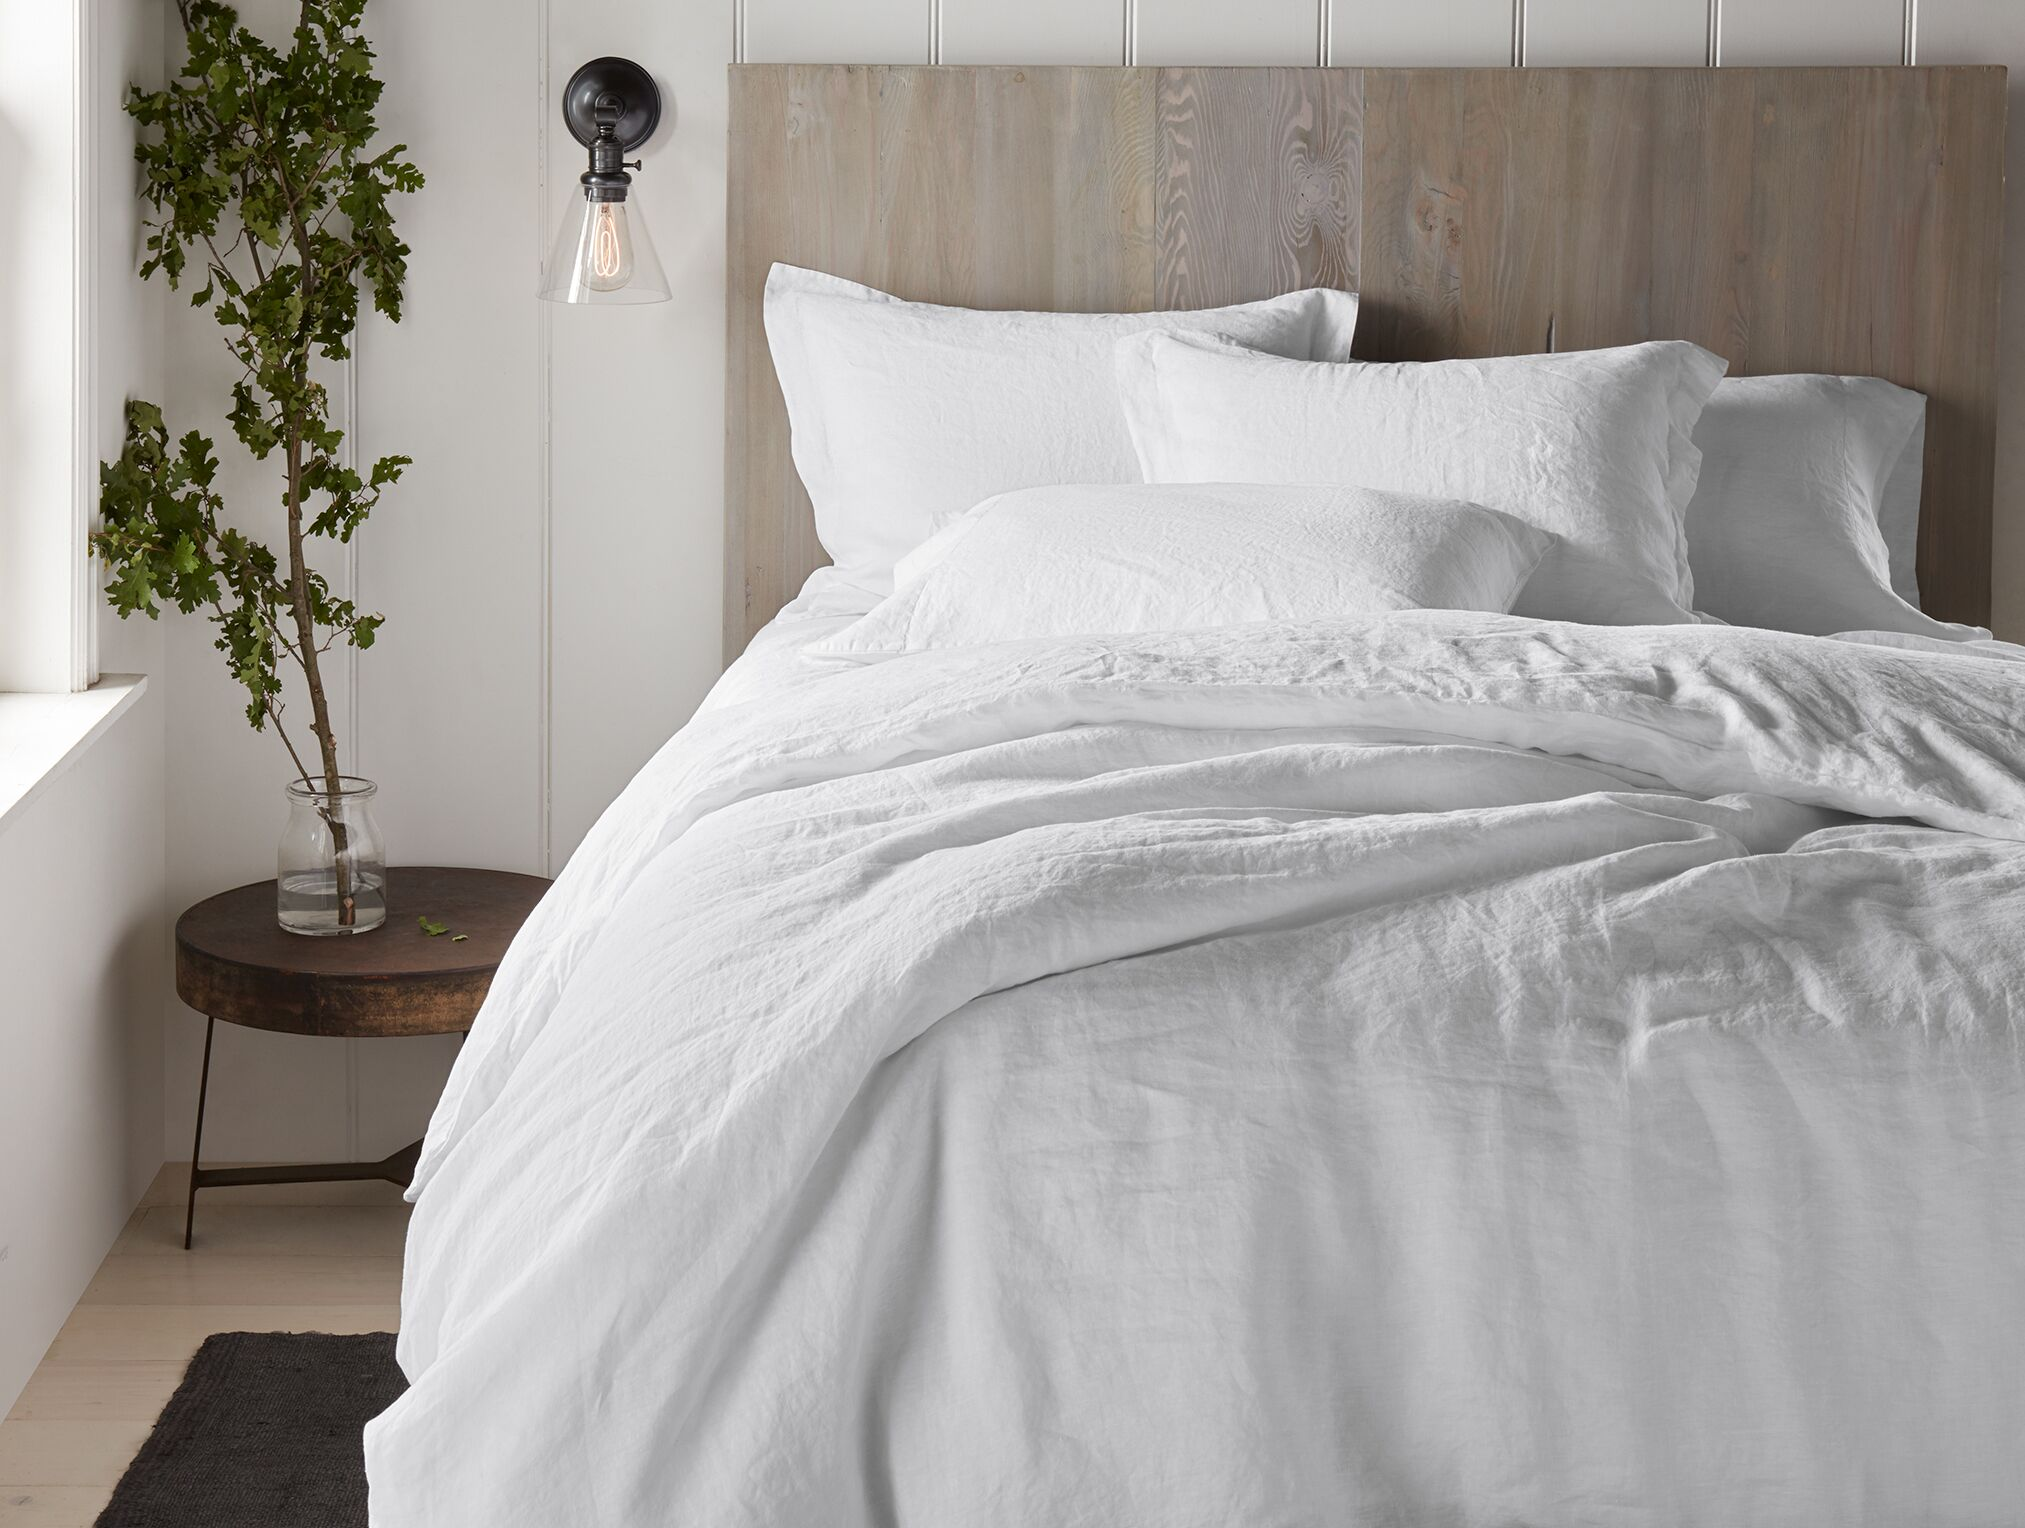 Organic Relaxed Linen Sham Color: Alpine White, Size: Standard